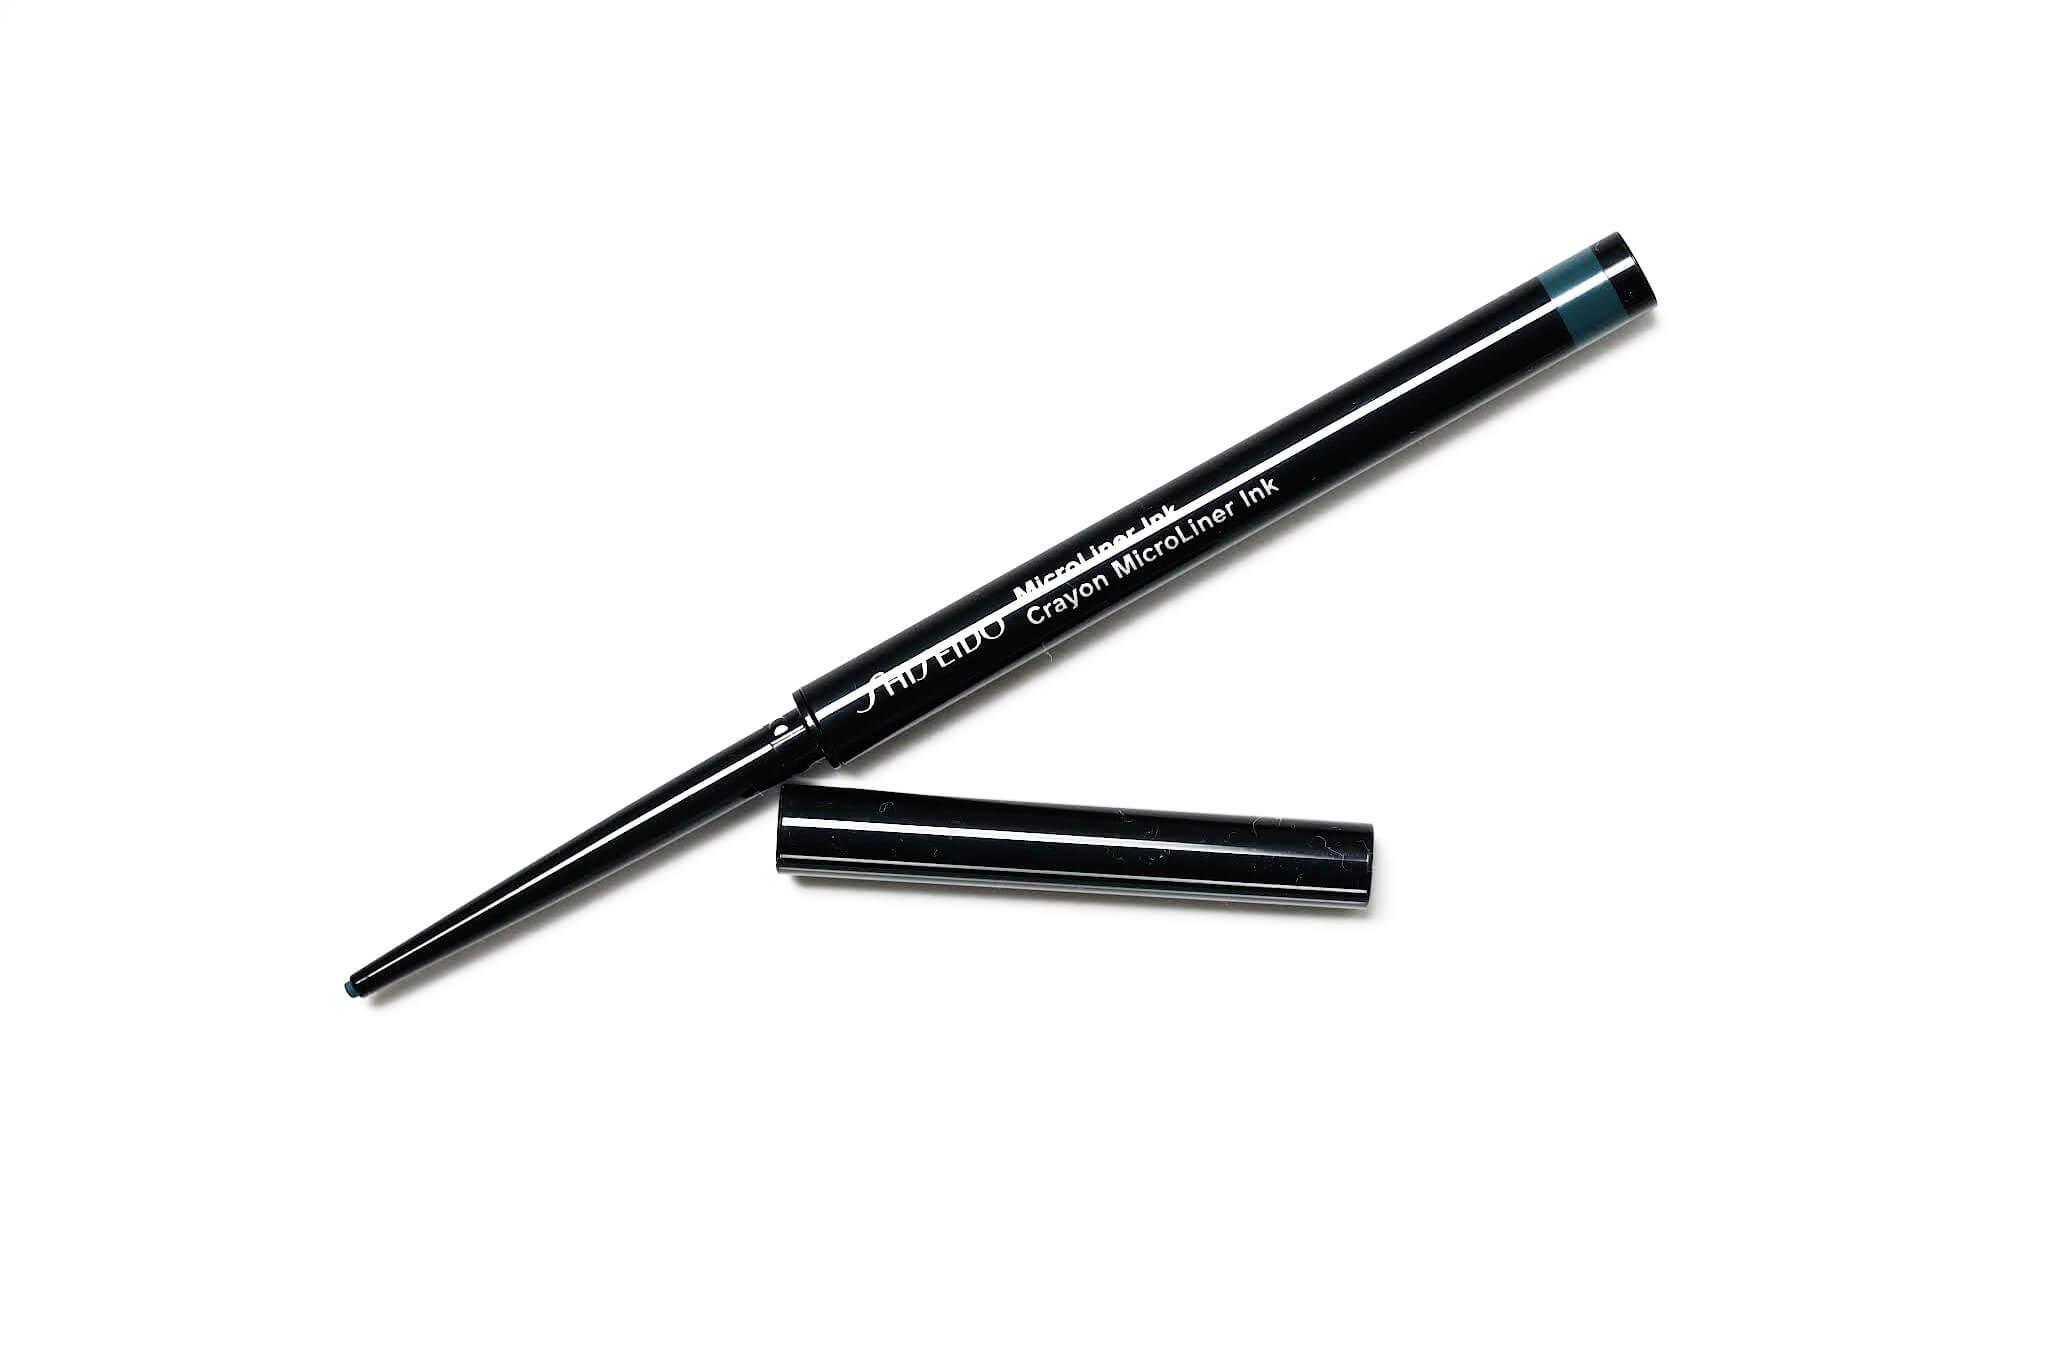 Shiseido MicroLiner Ink 08 Teal